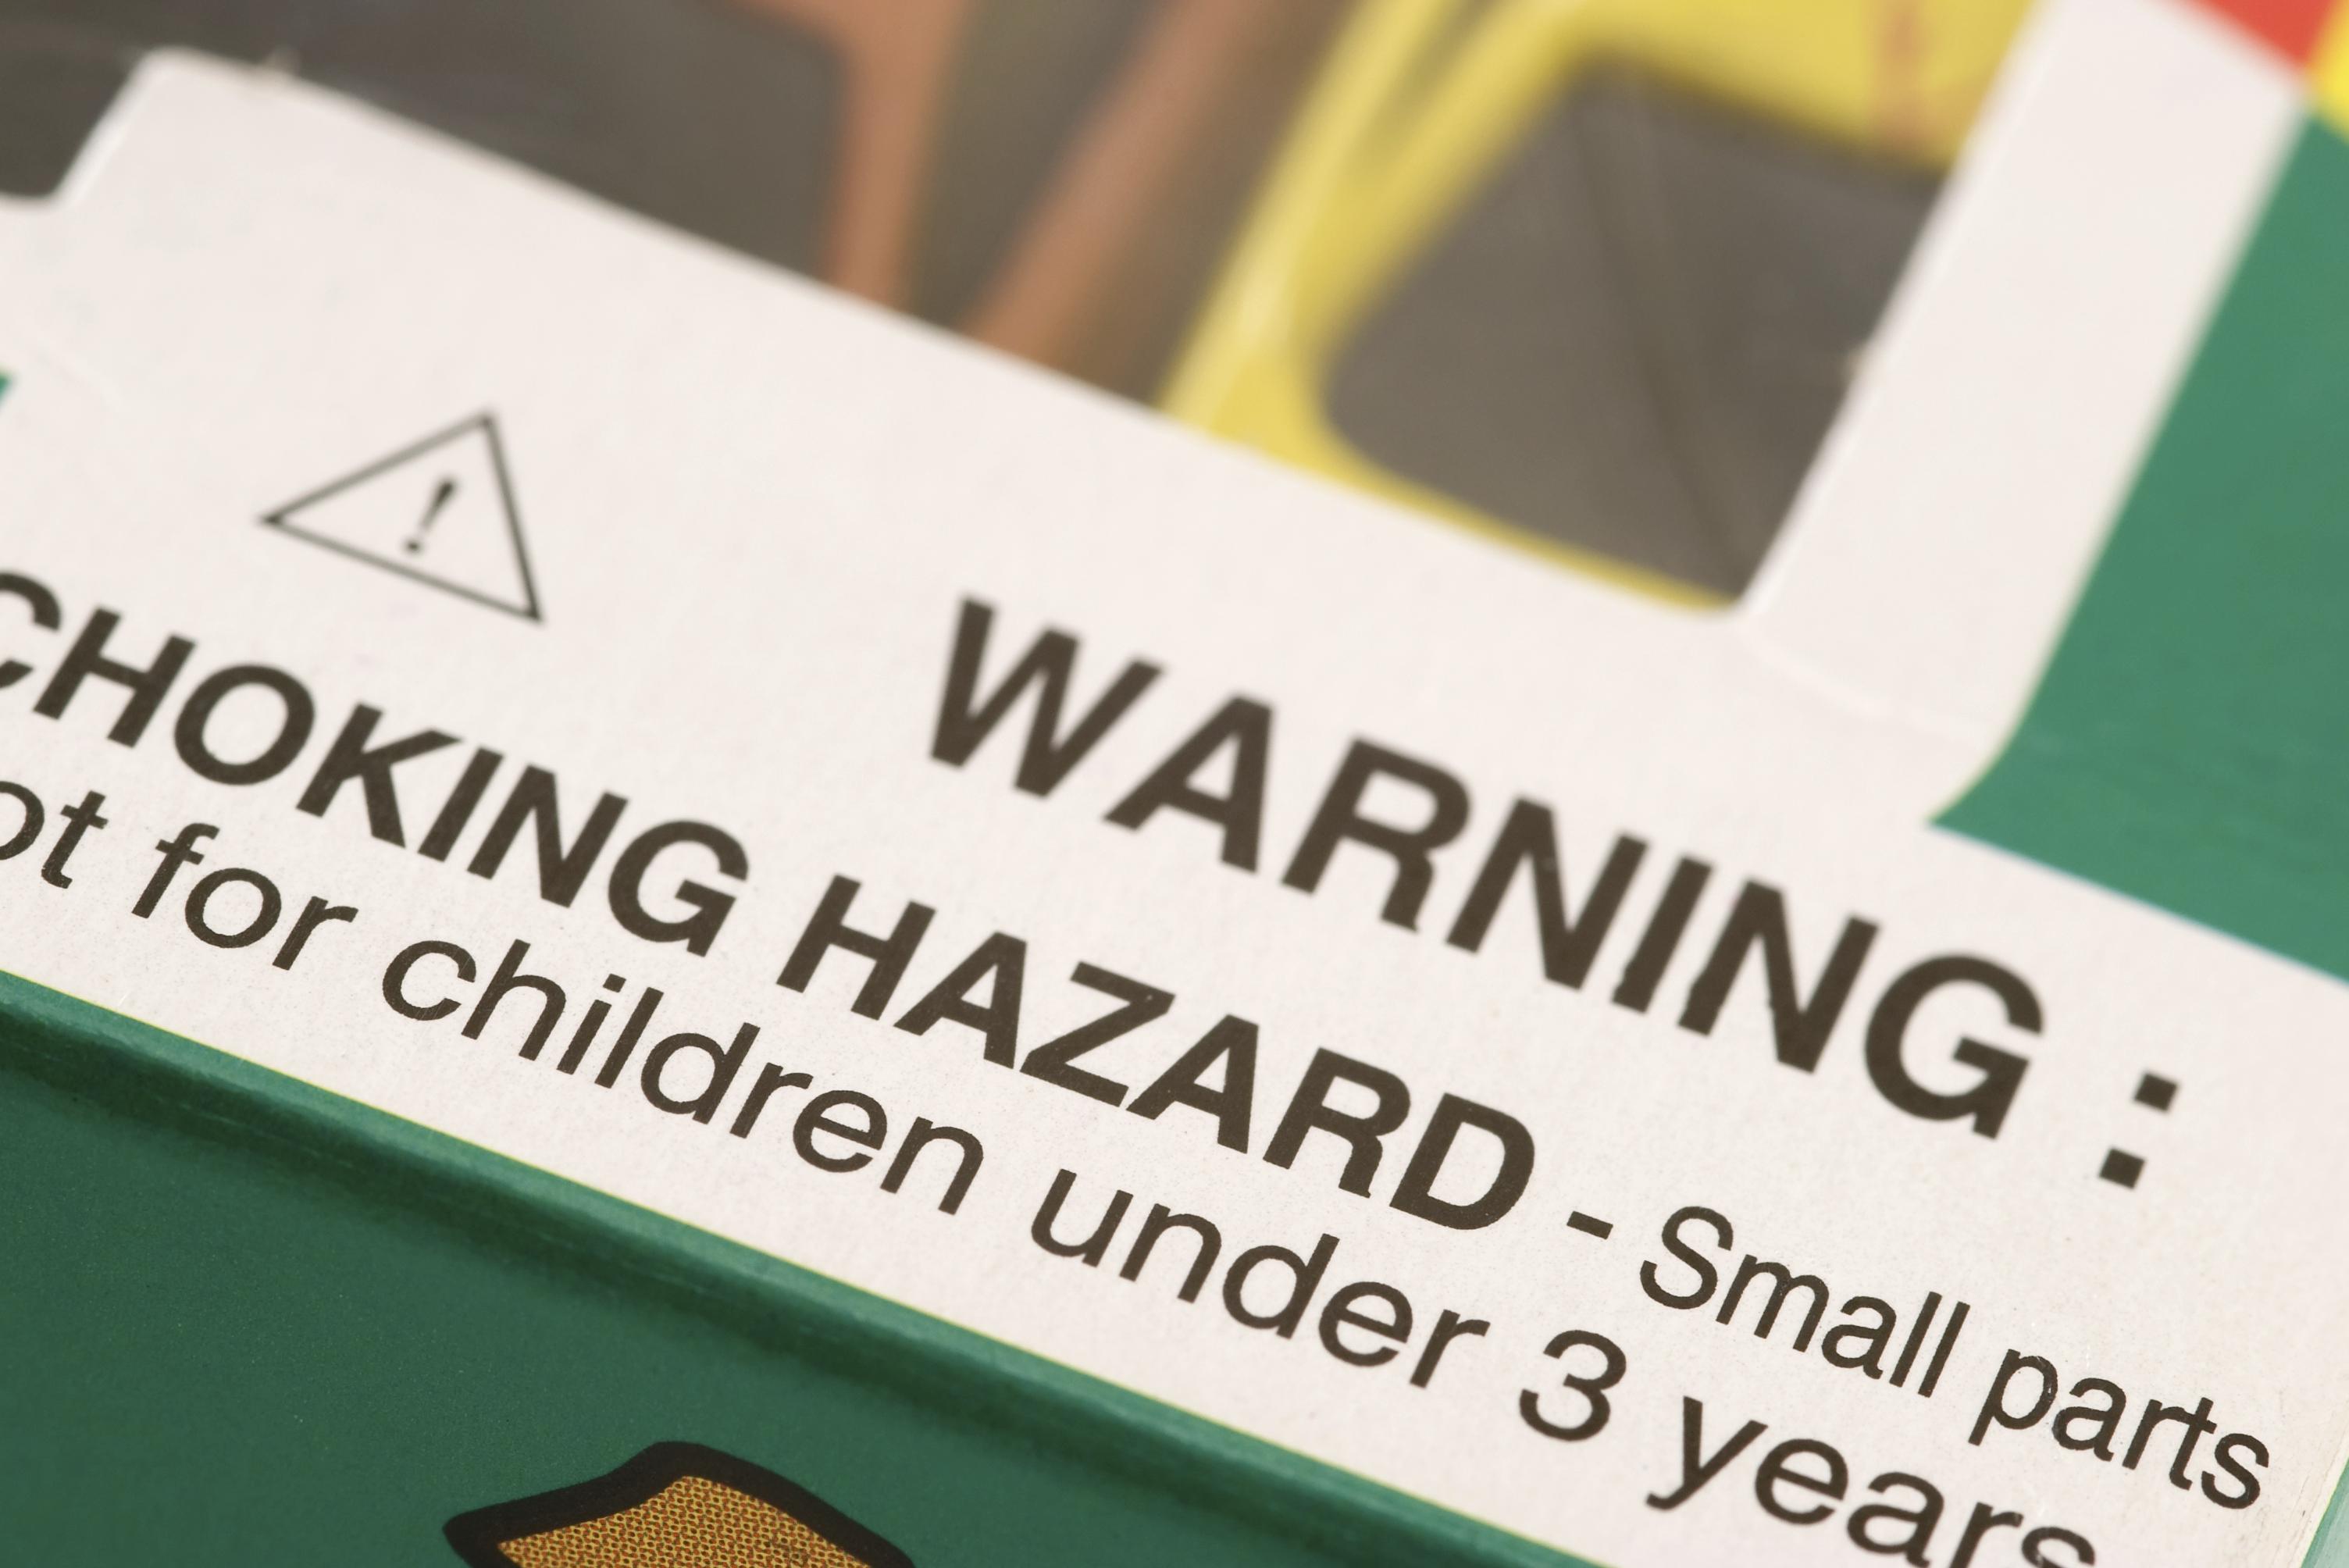 Warning on Toy